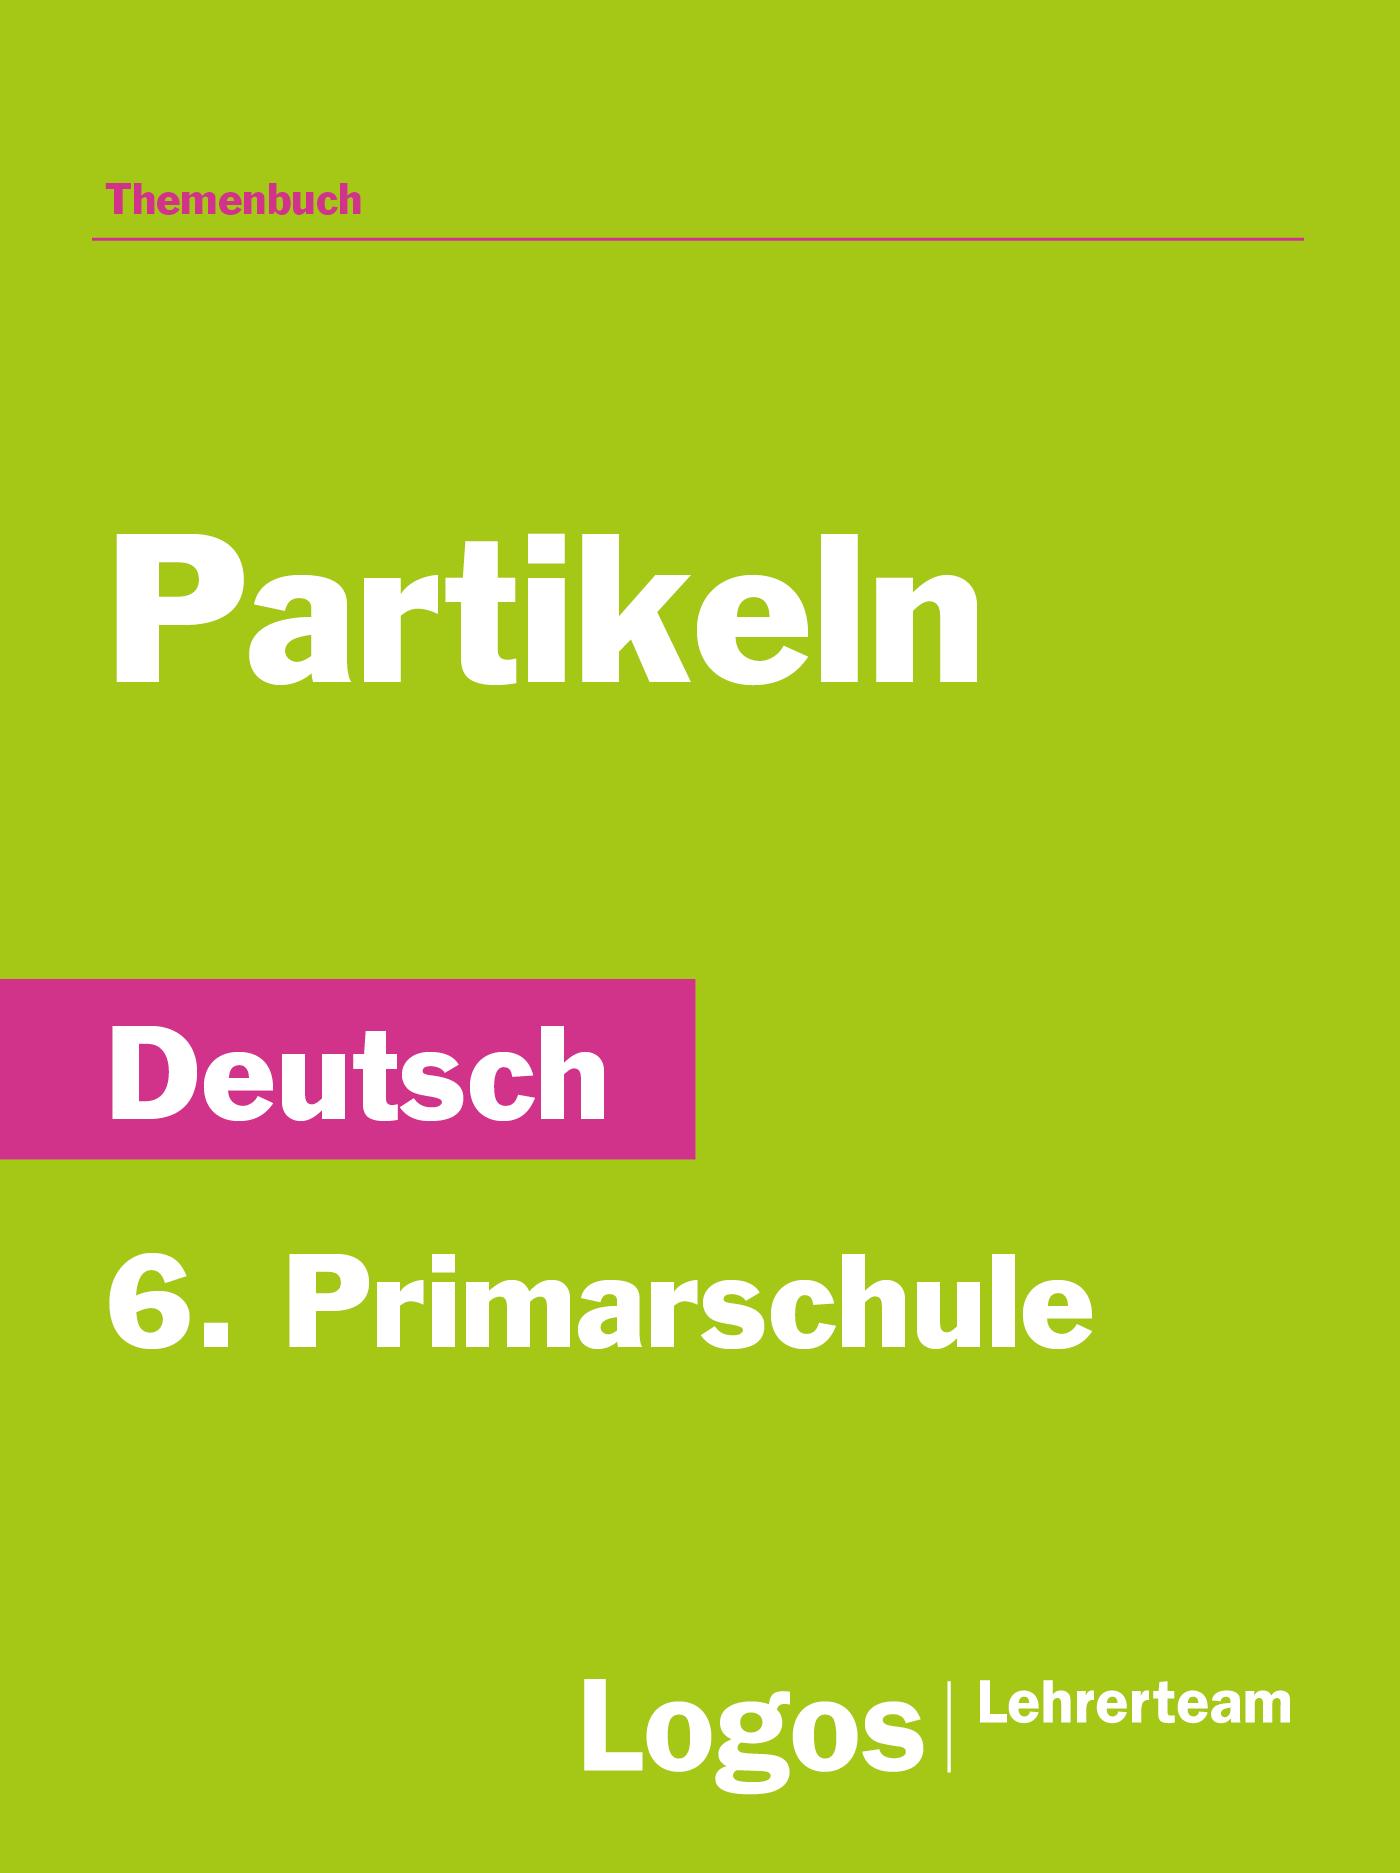 PD Partikeln.png